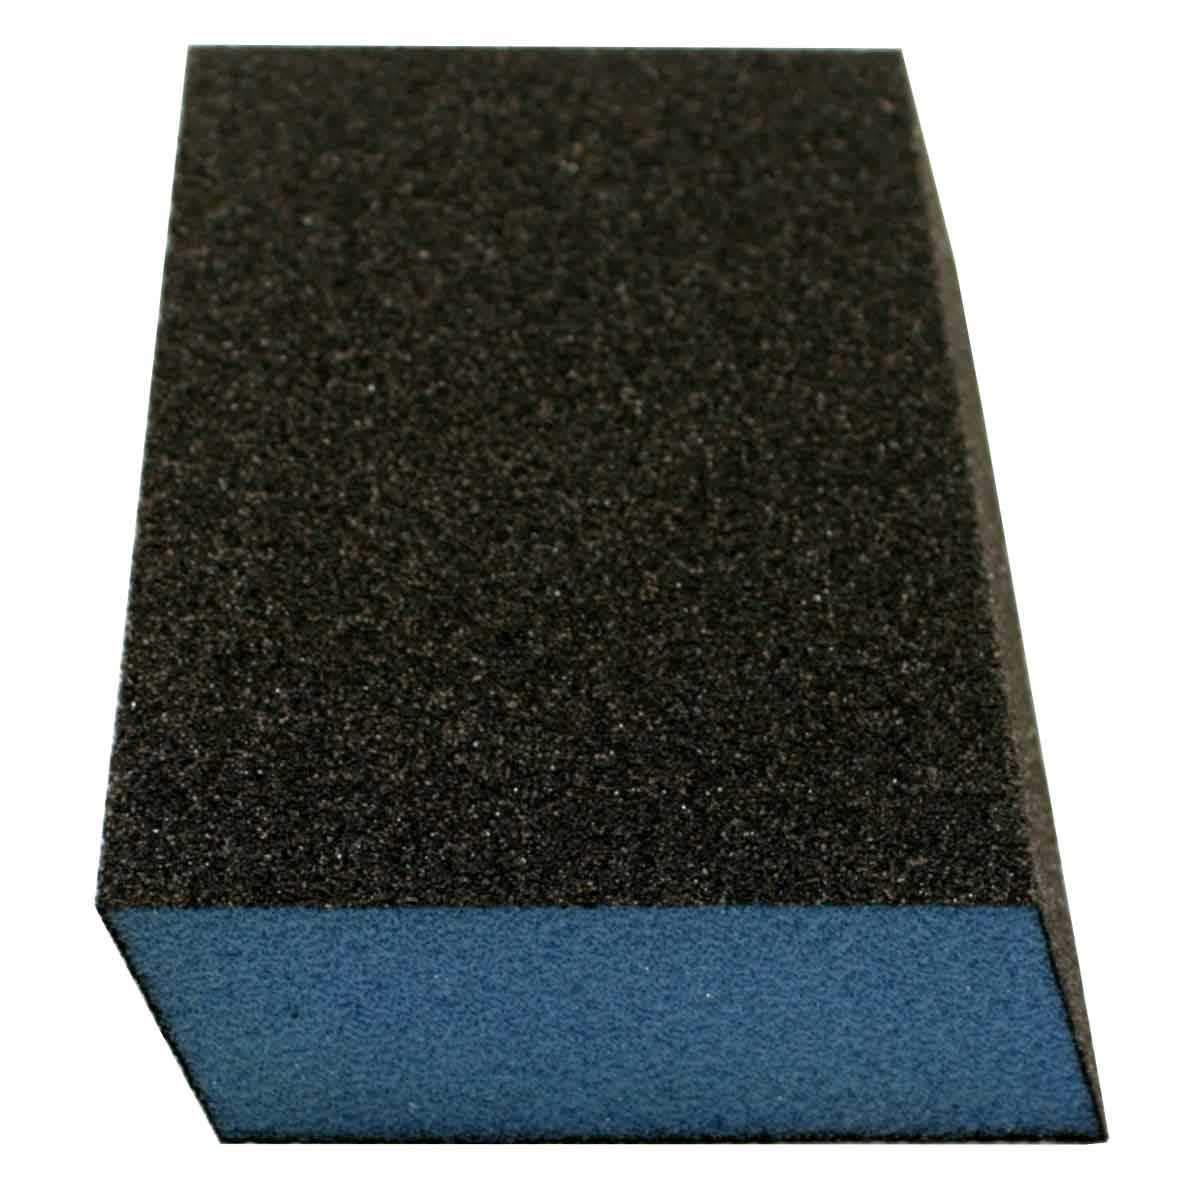 Medium//Fine Grit Webb Abrasives 400037 Double Slant Block Sanding Sponges 24 Pack 3 x 5 x 1 by Webb Abrasives